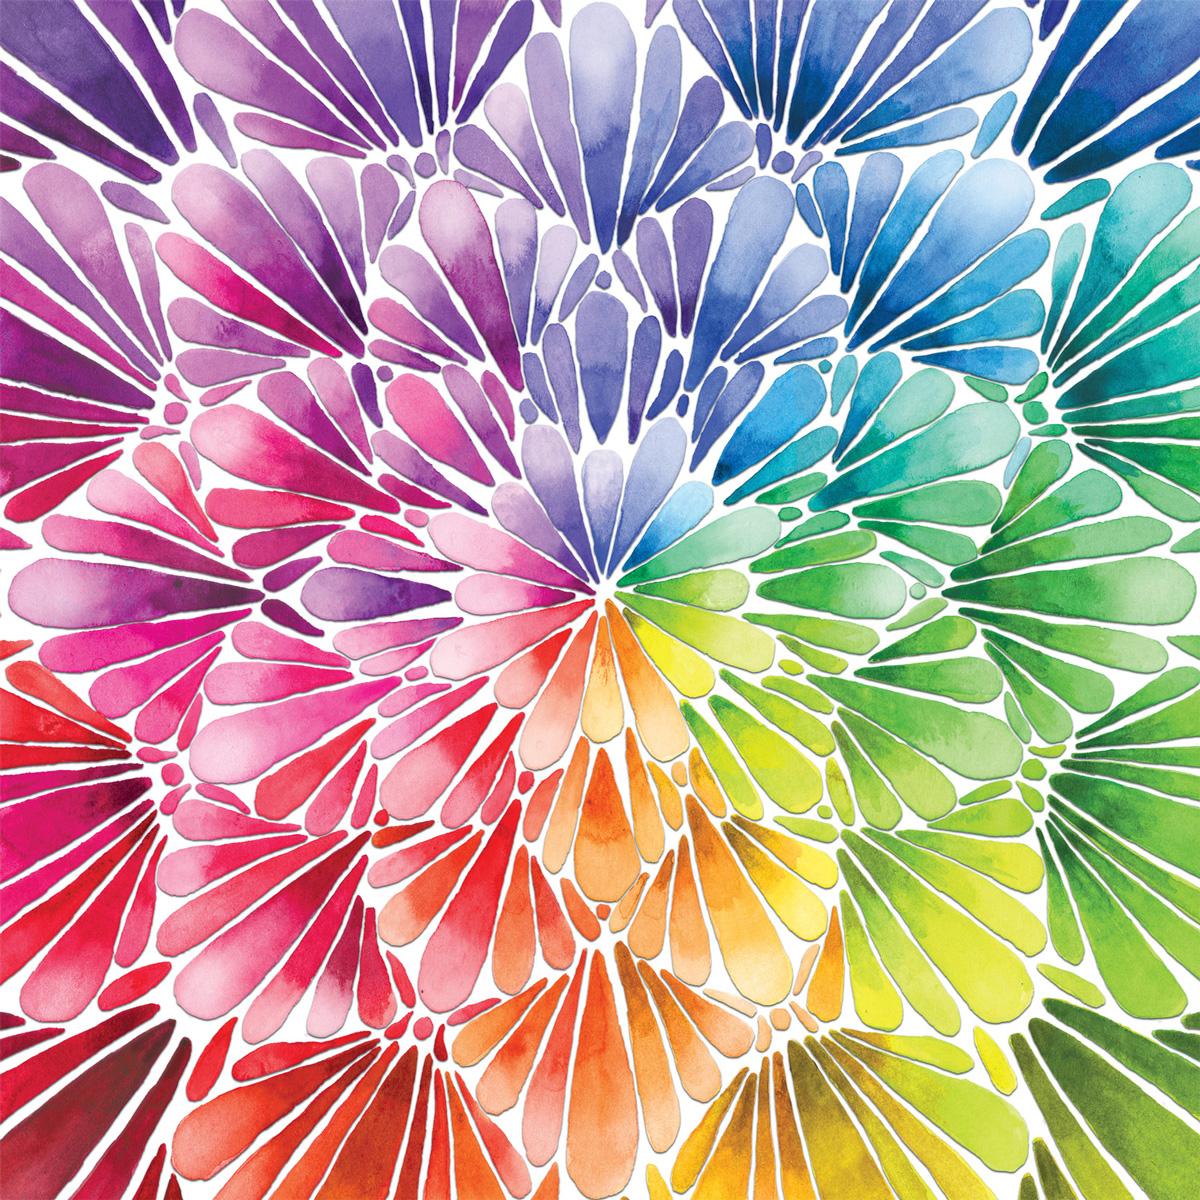 Square Petals Graphics / Illustration Jigsaw Puzzle